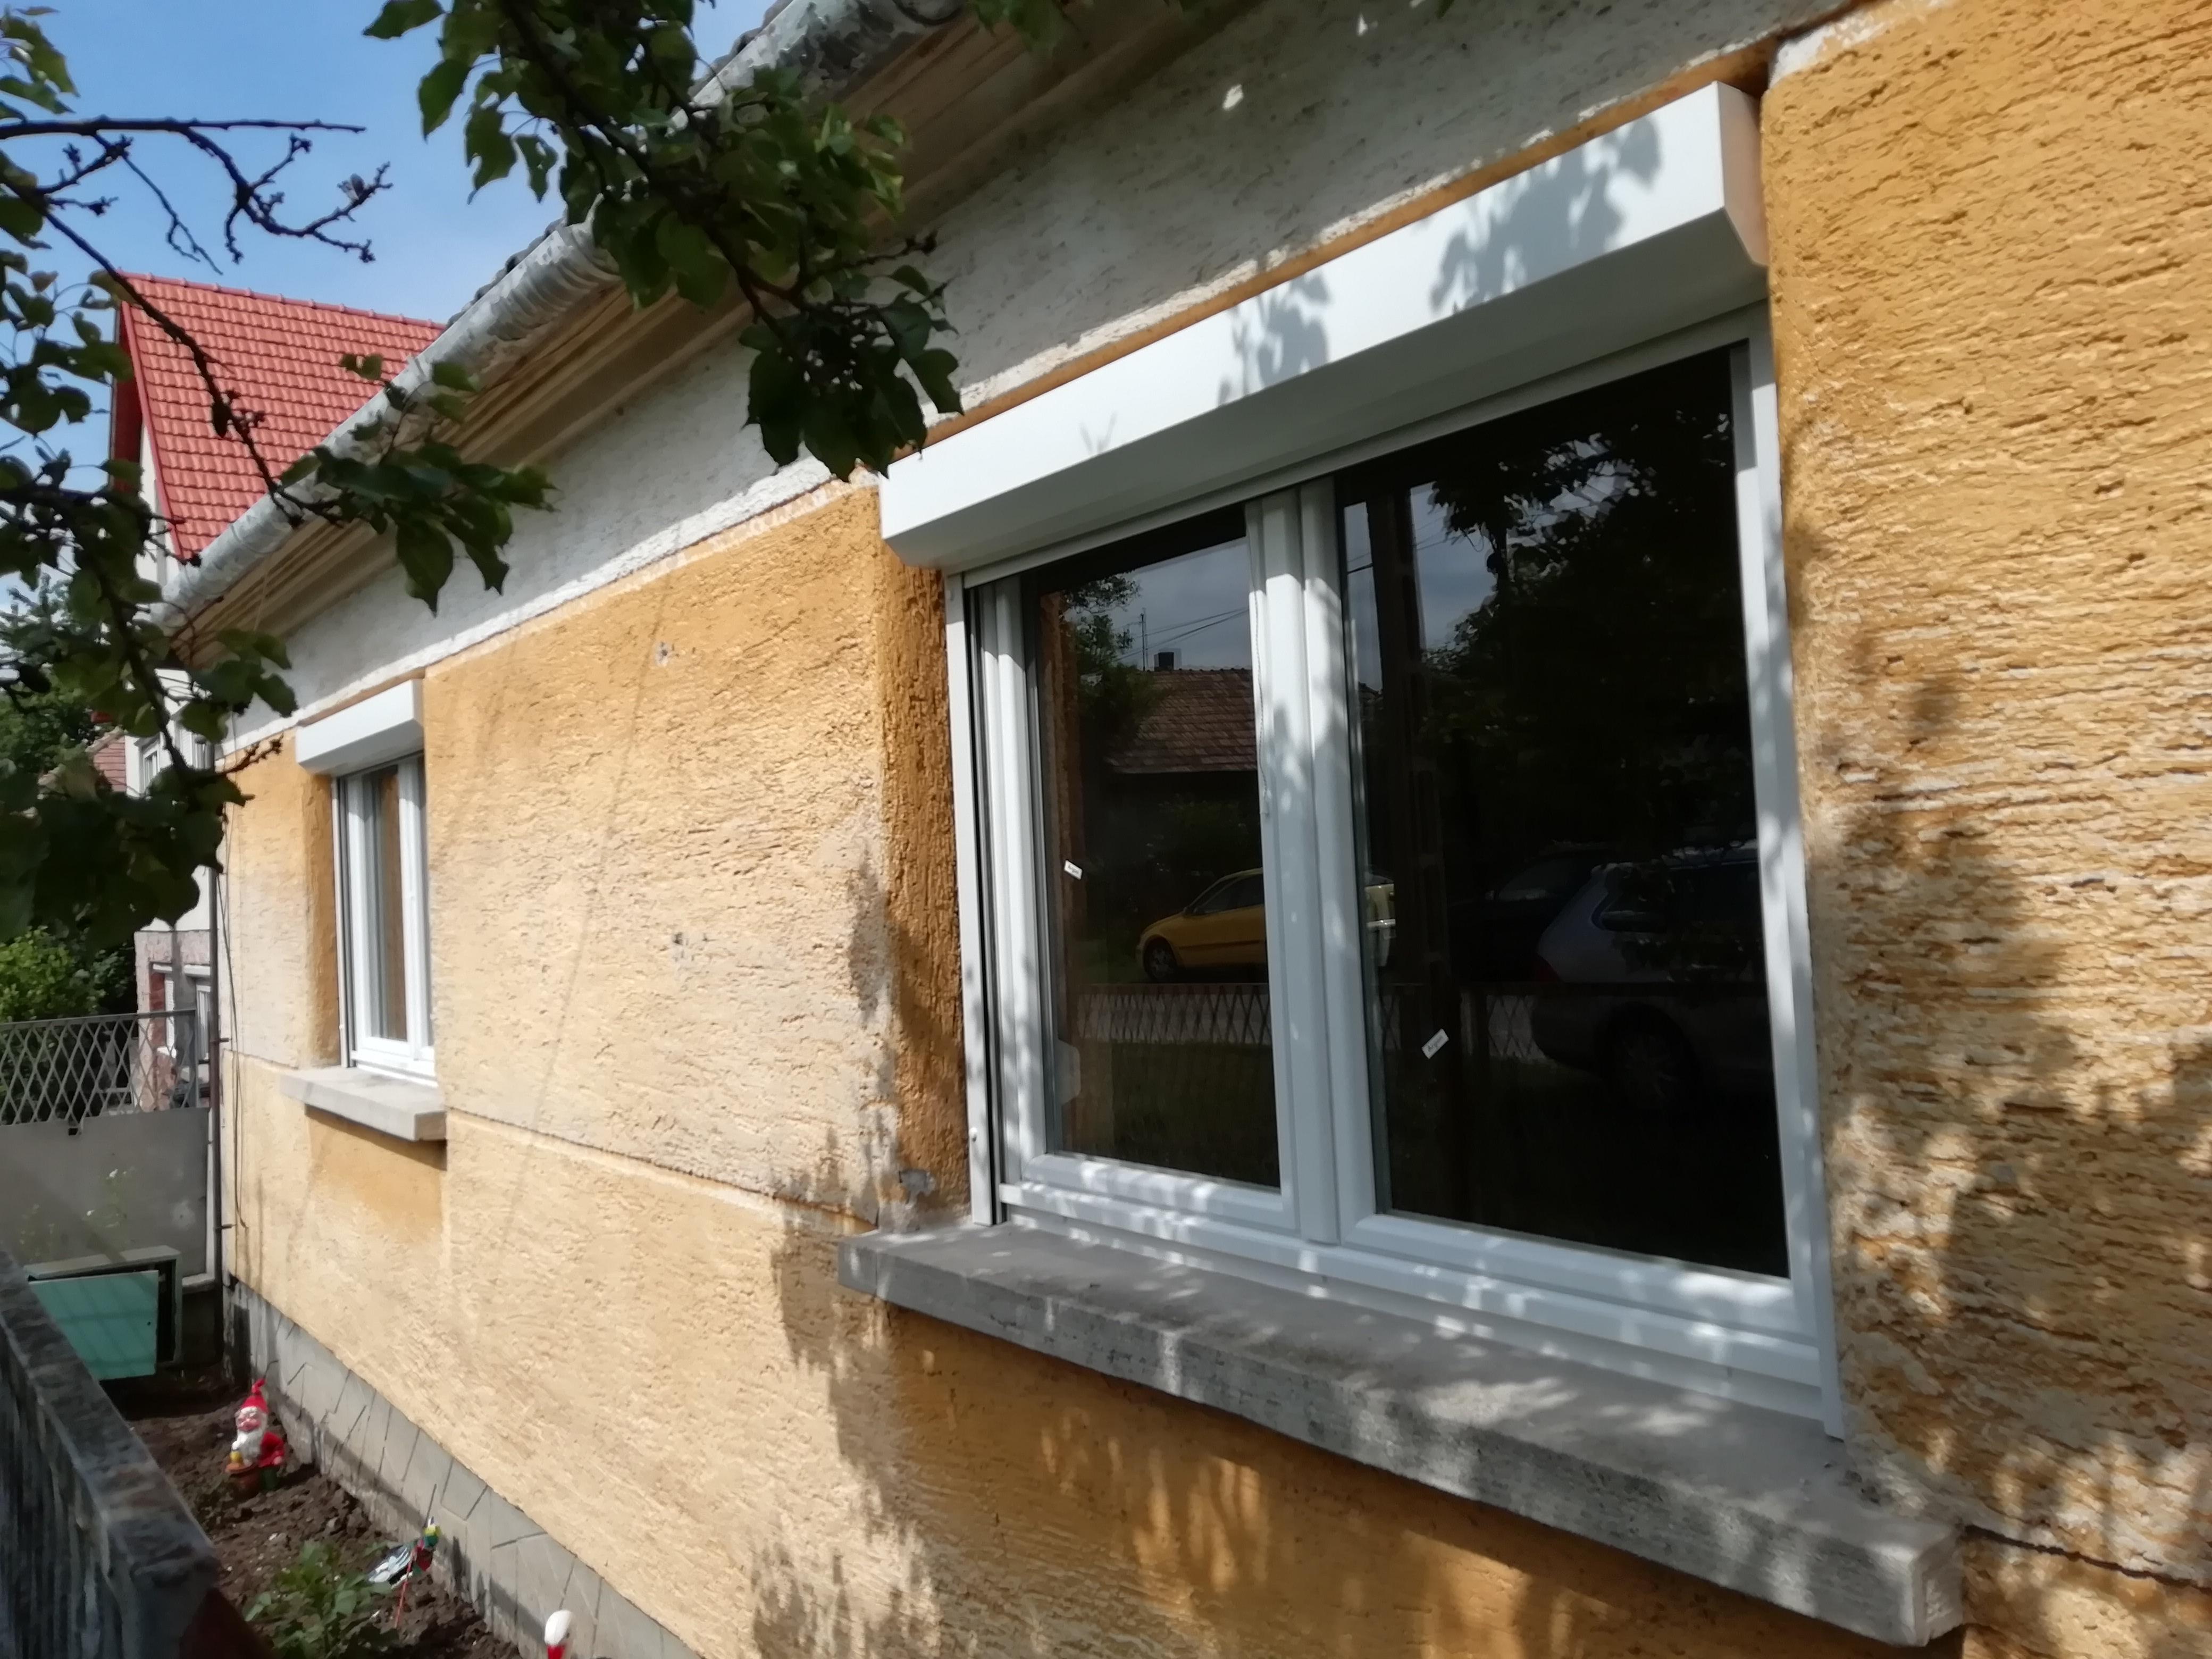 csaladi-haz-kulso-muanyag-ablak-beepites-6